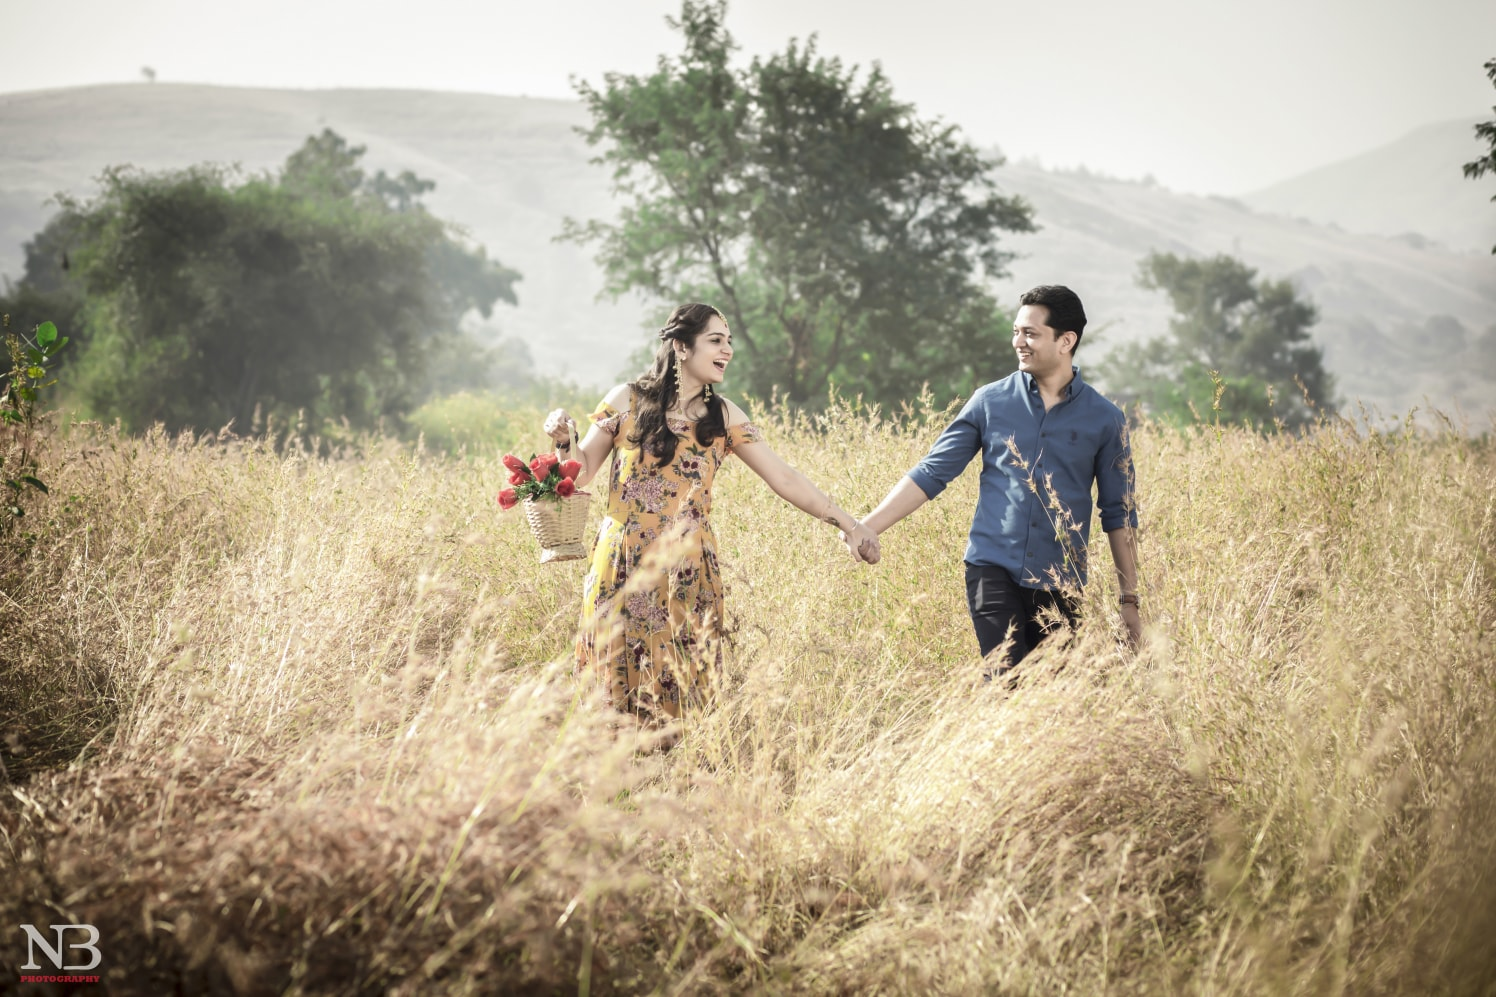 Romantic Pre-Wedding Shoot In A Wheat Field Background by Nikhil Y. Bharane Wedding-photography | Weddings Photos & Ideas